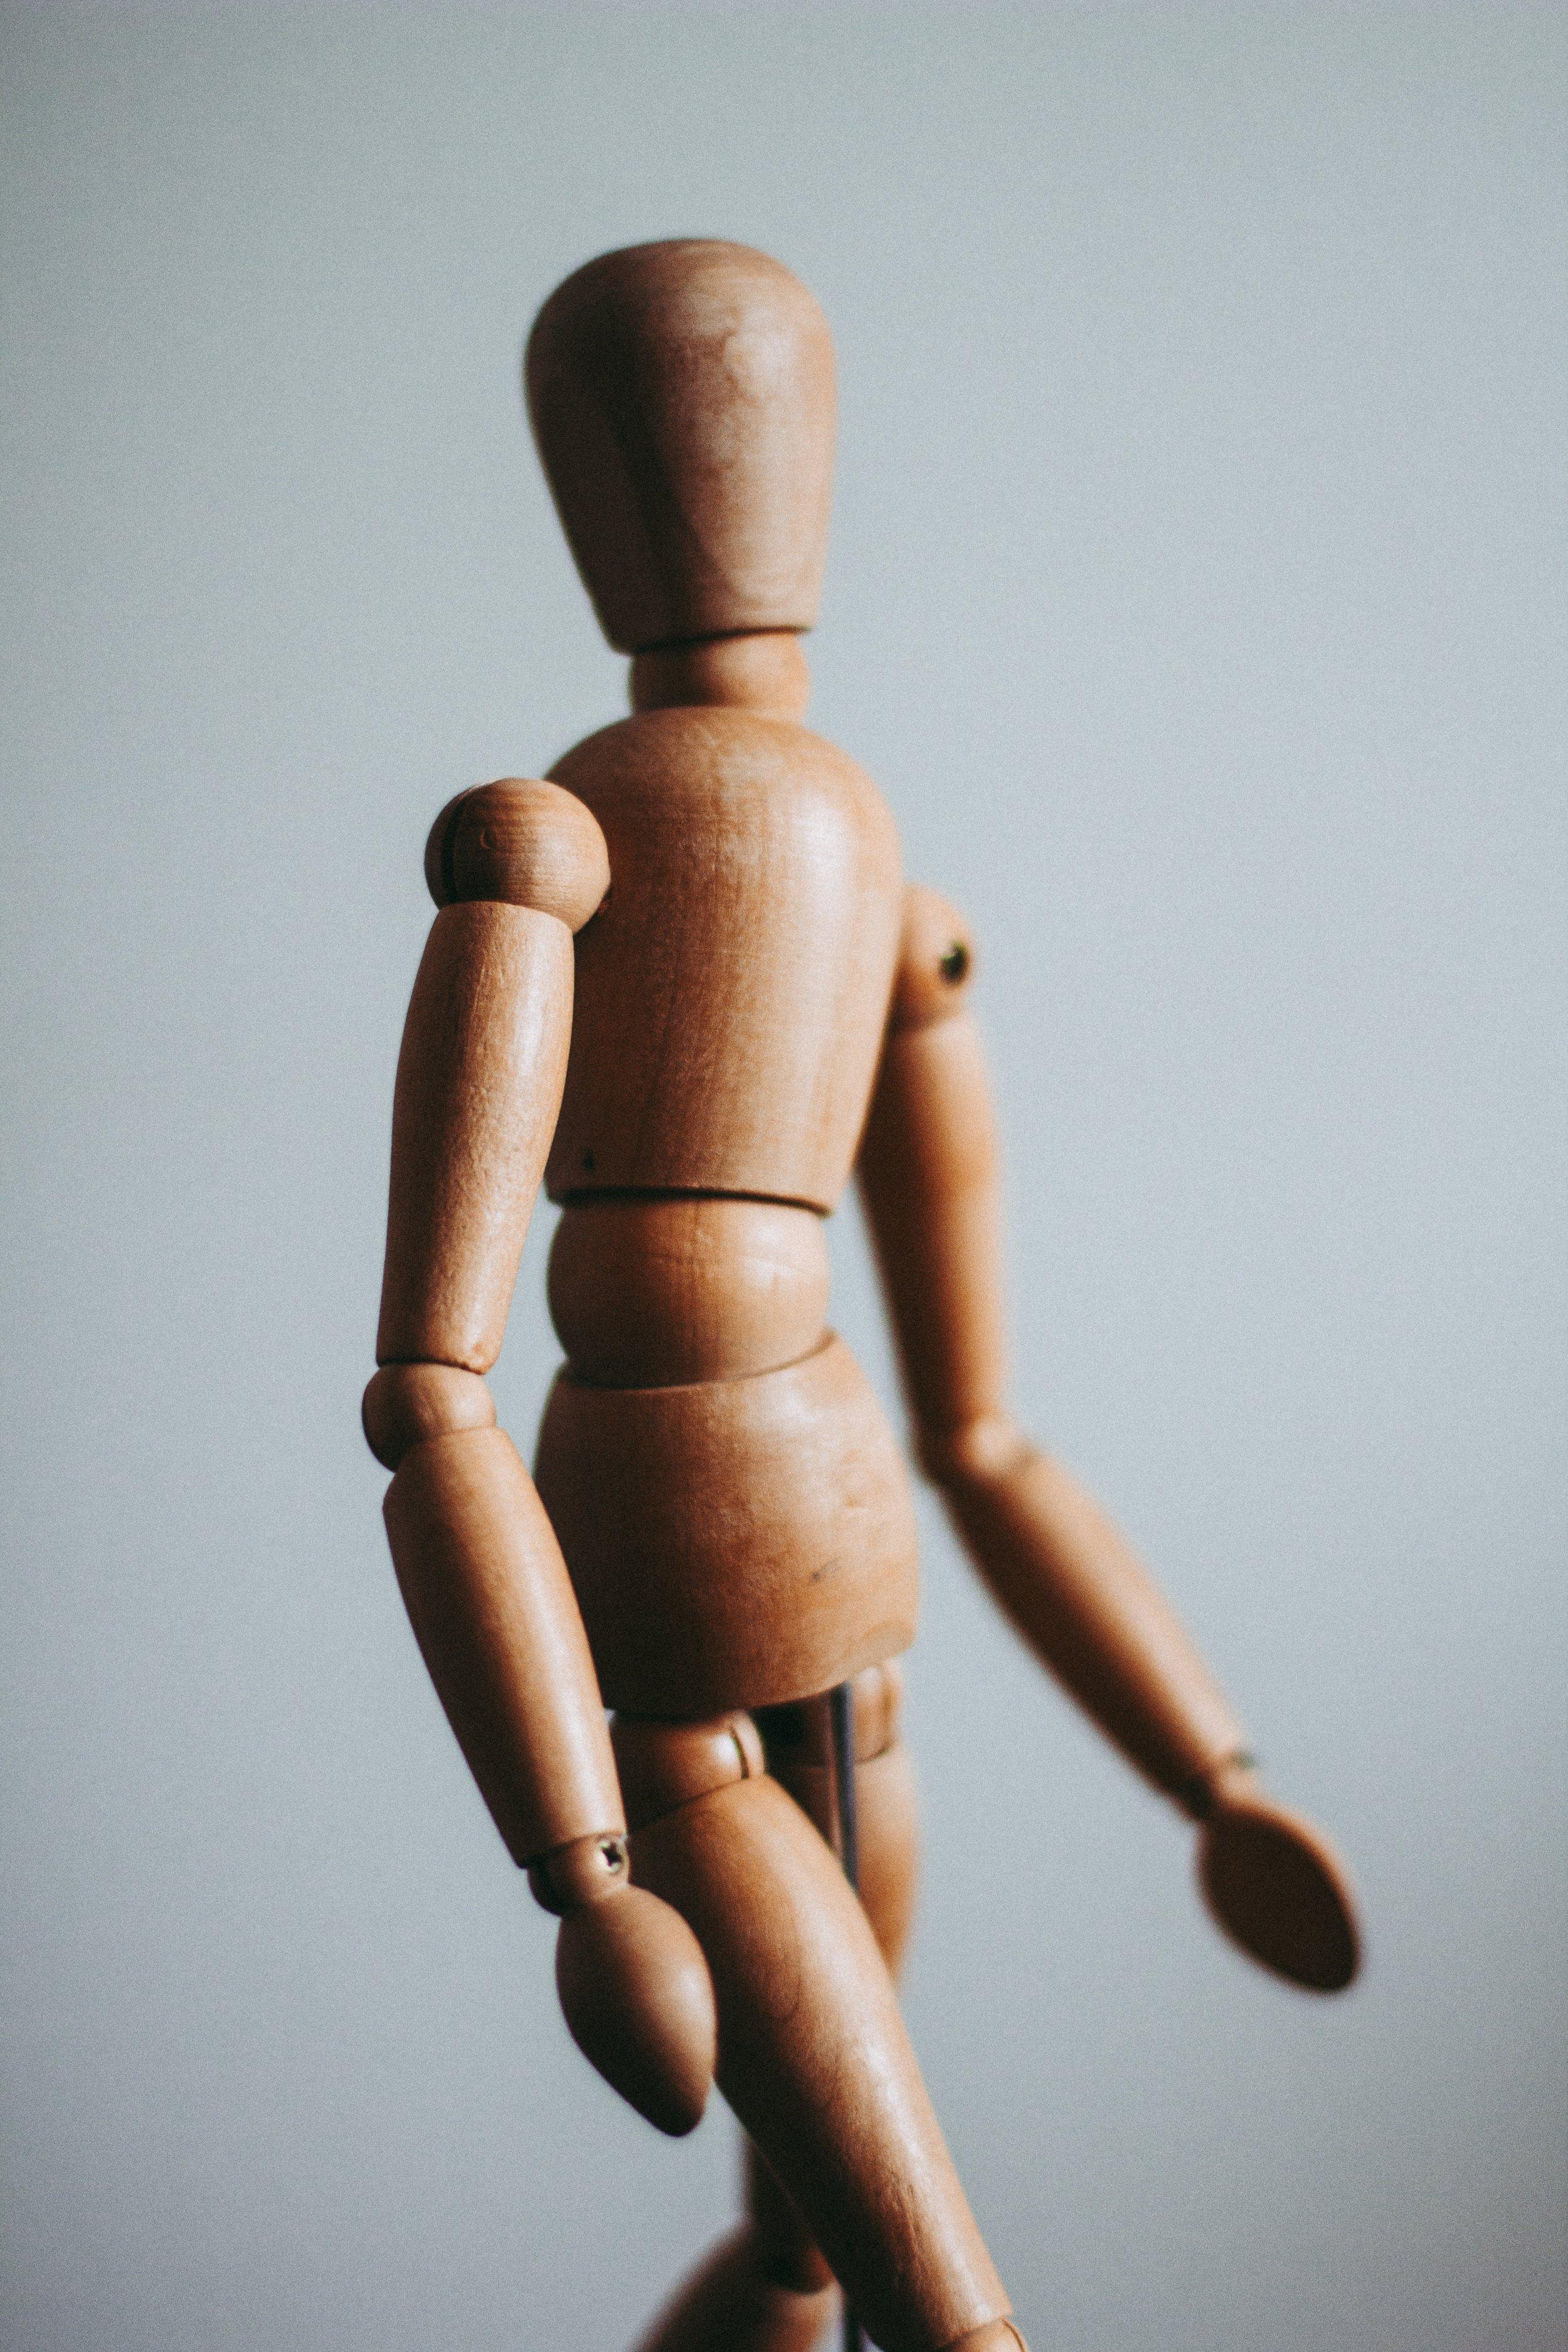 Photo by  Kira auf der Heide  on  Unsplash    [Image Description: A wooden, articulated figure doll stands against a grey background]